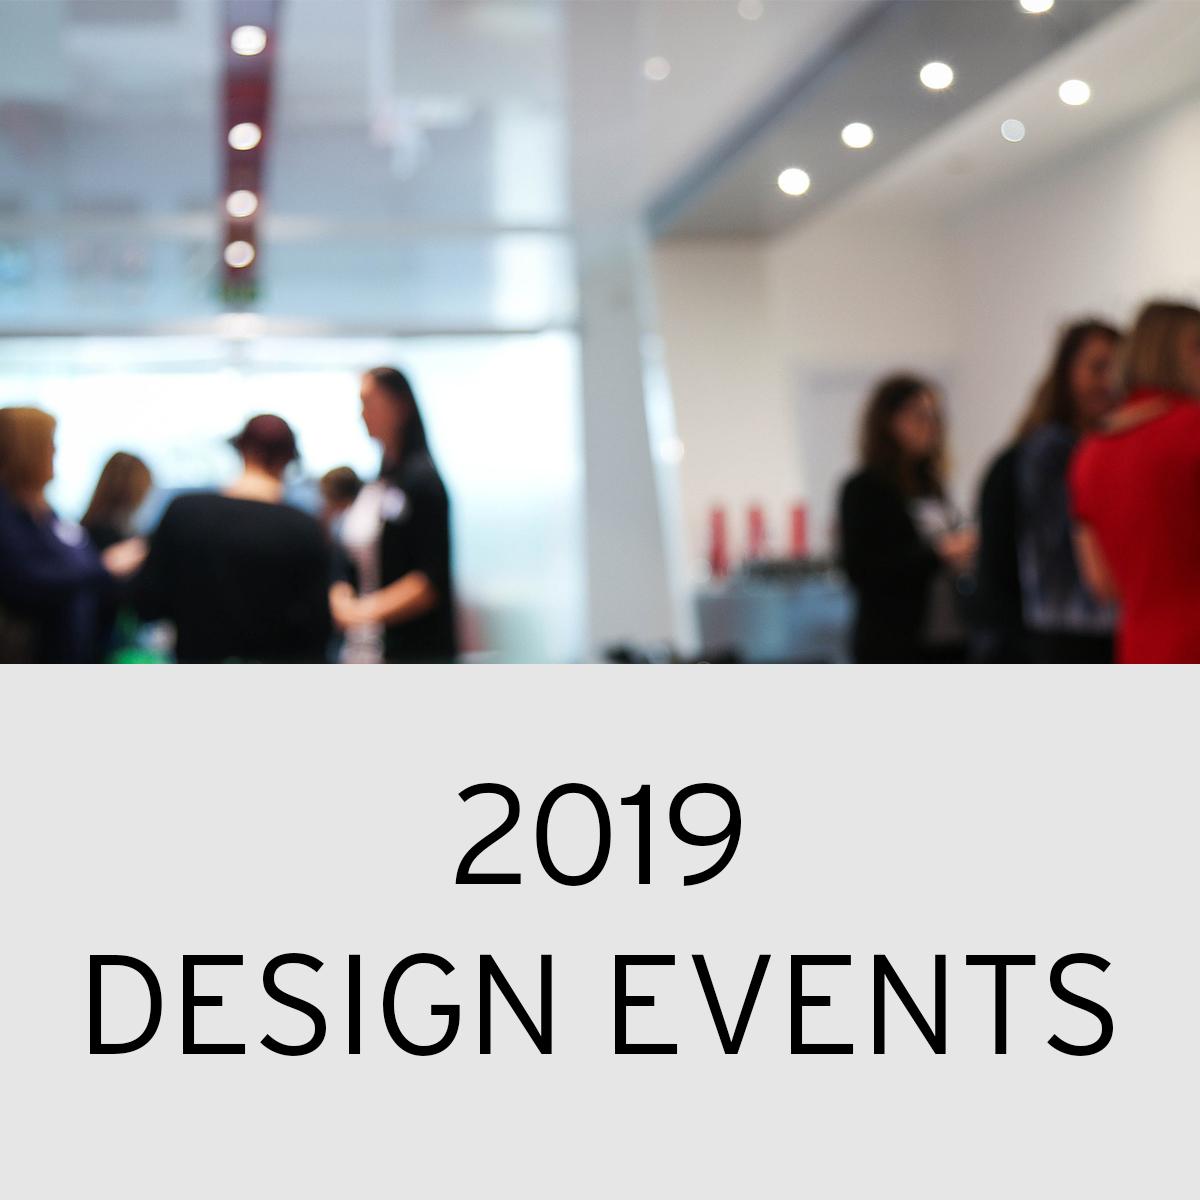 93cc8b14da 2019 Design Events — Dering Hall